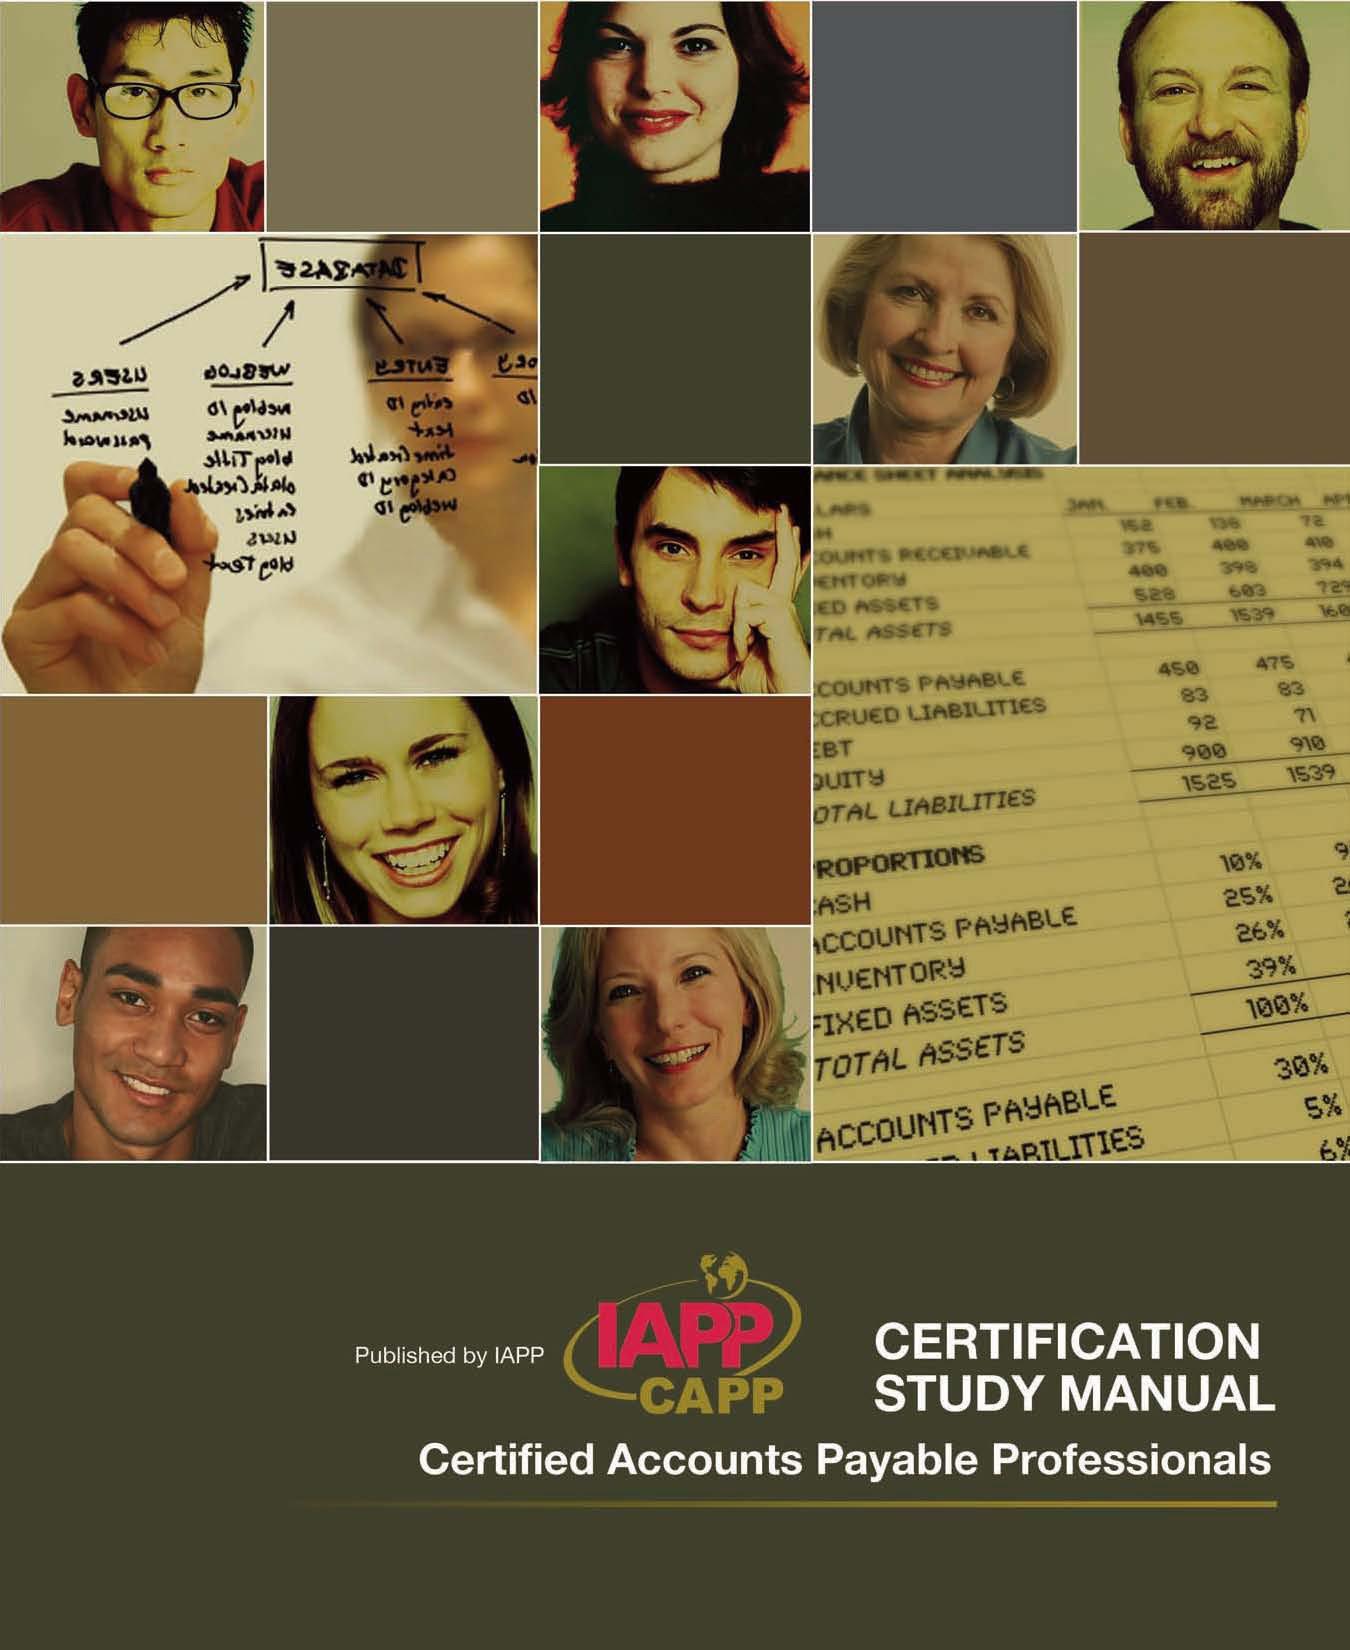 Capp Certification Study Manual Iapp 9780982359501 Amazon Books